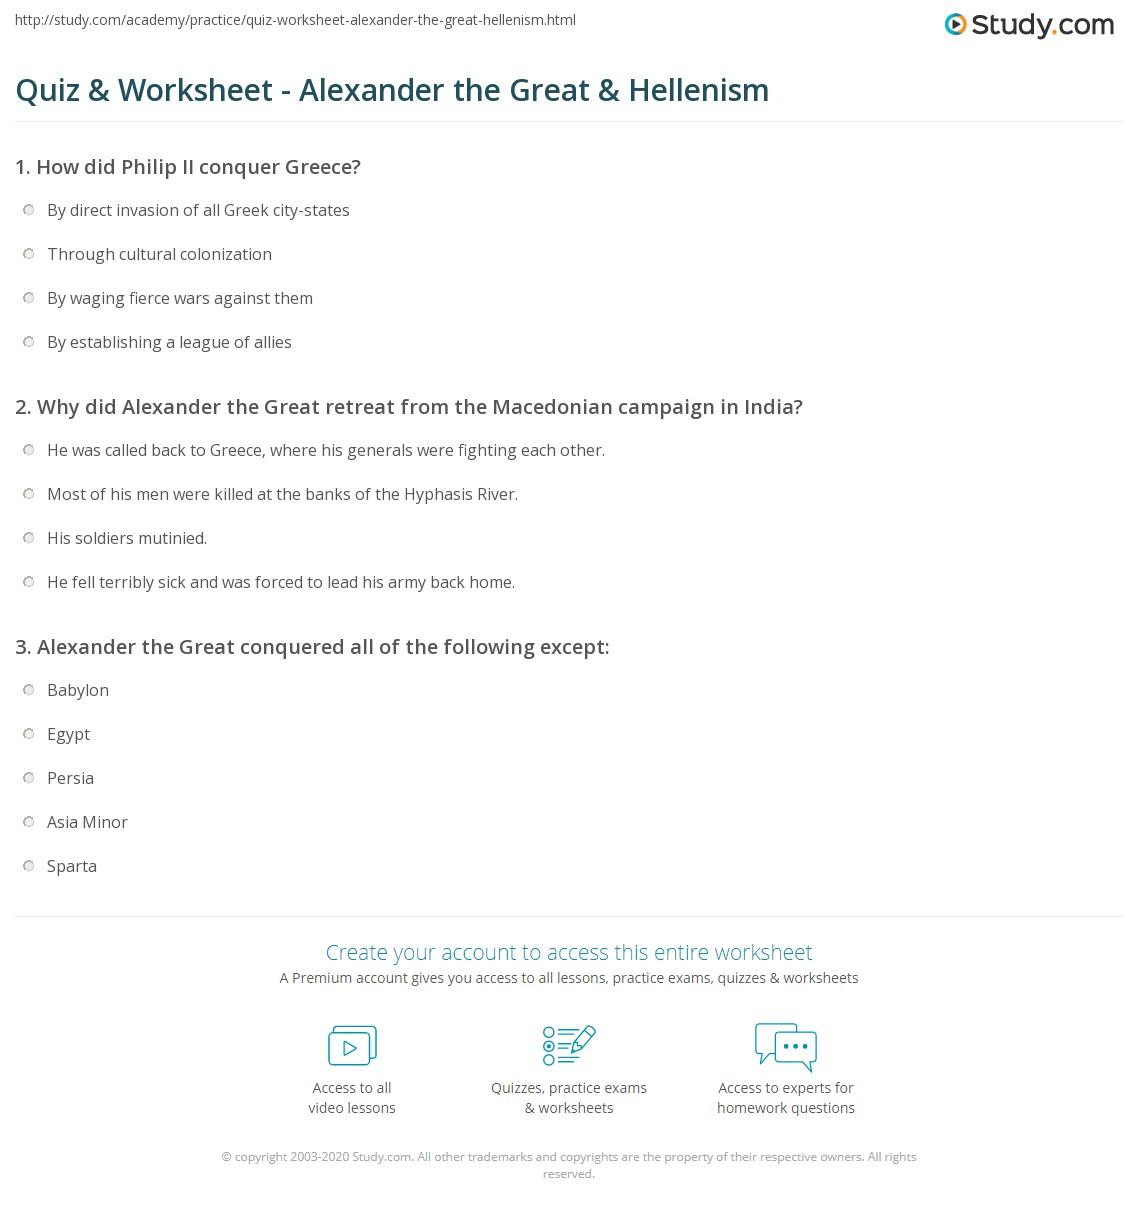 Worksheets Alexander The Great Worksheet quiz worksheet alexander the great hellenism study com print and birth of worksheet